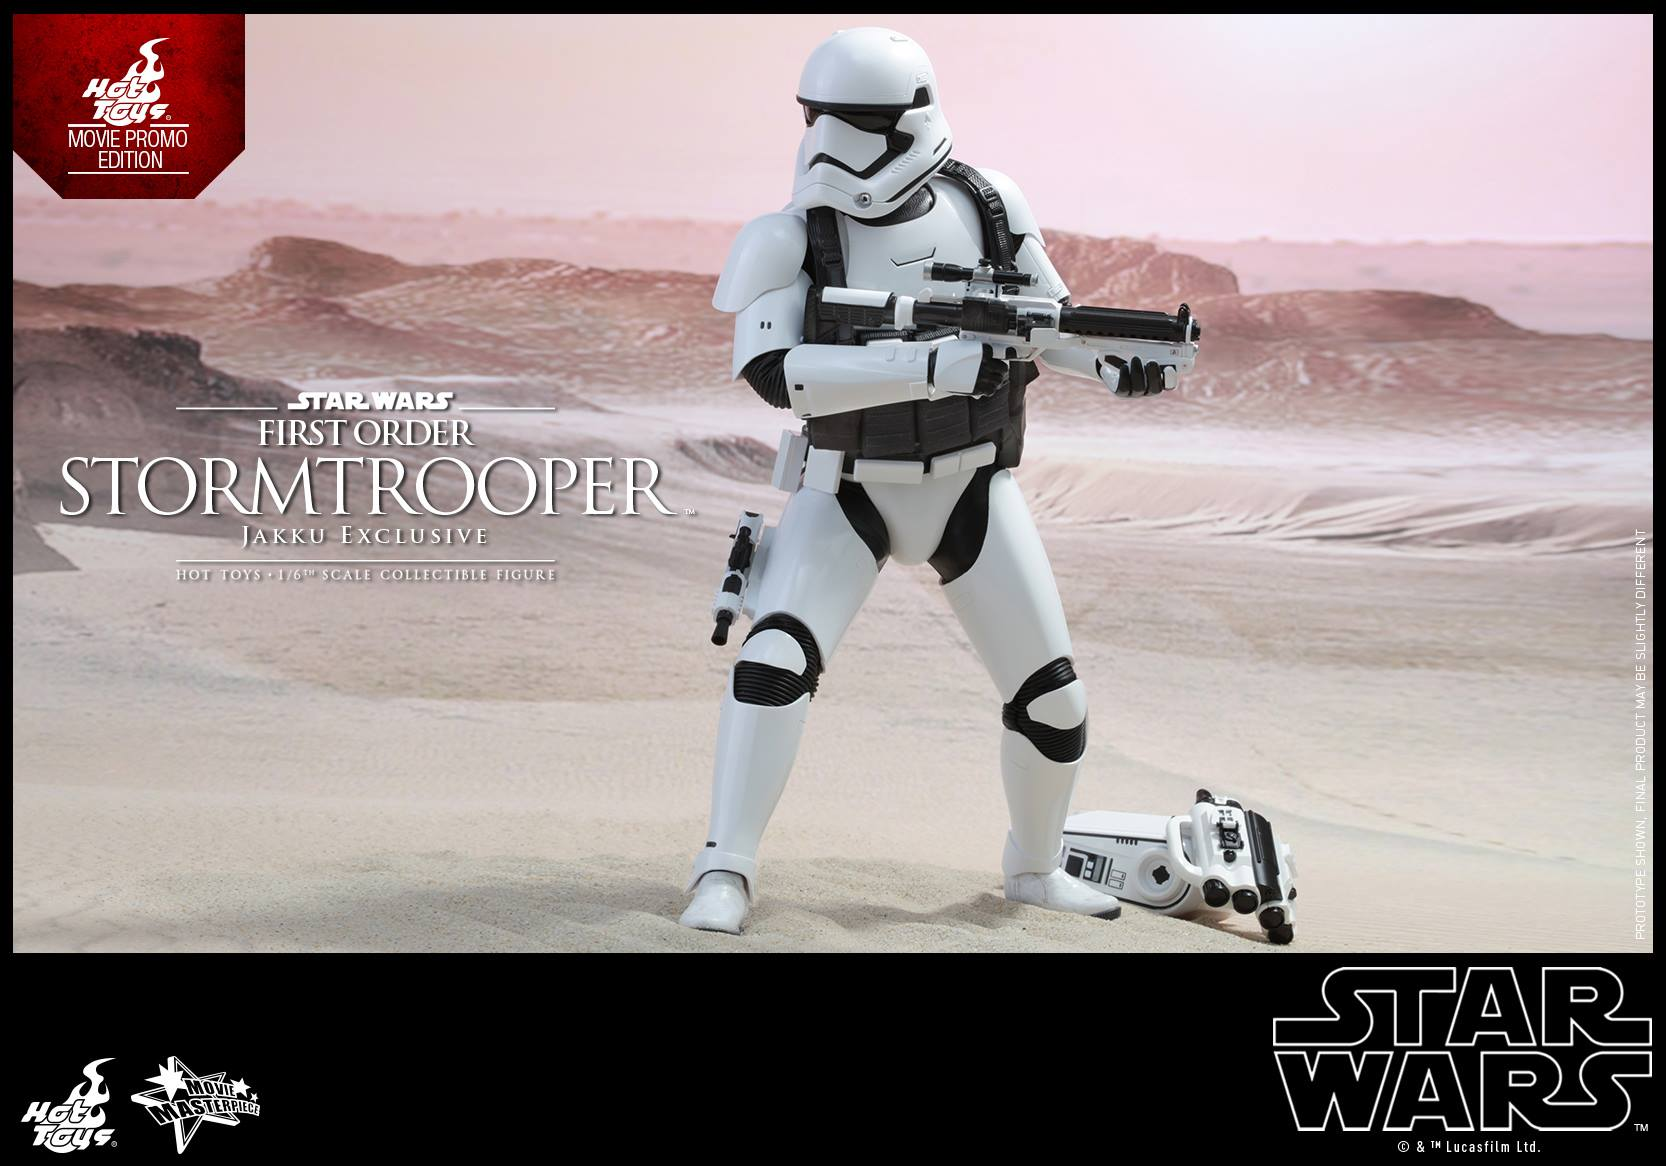 Details On Hot Toys Star Wars: The Force Awakens Jakku Stormtrooper Figure